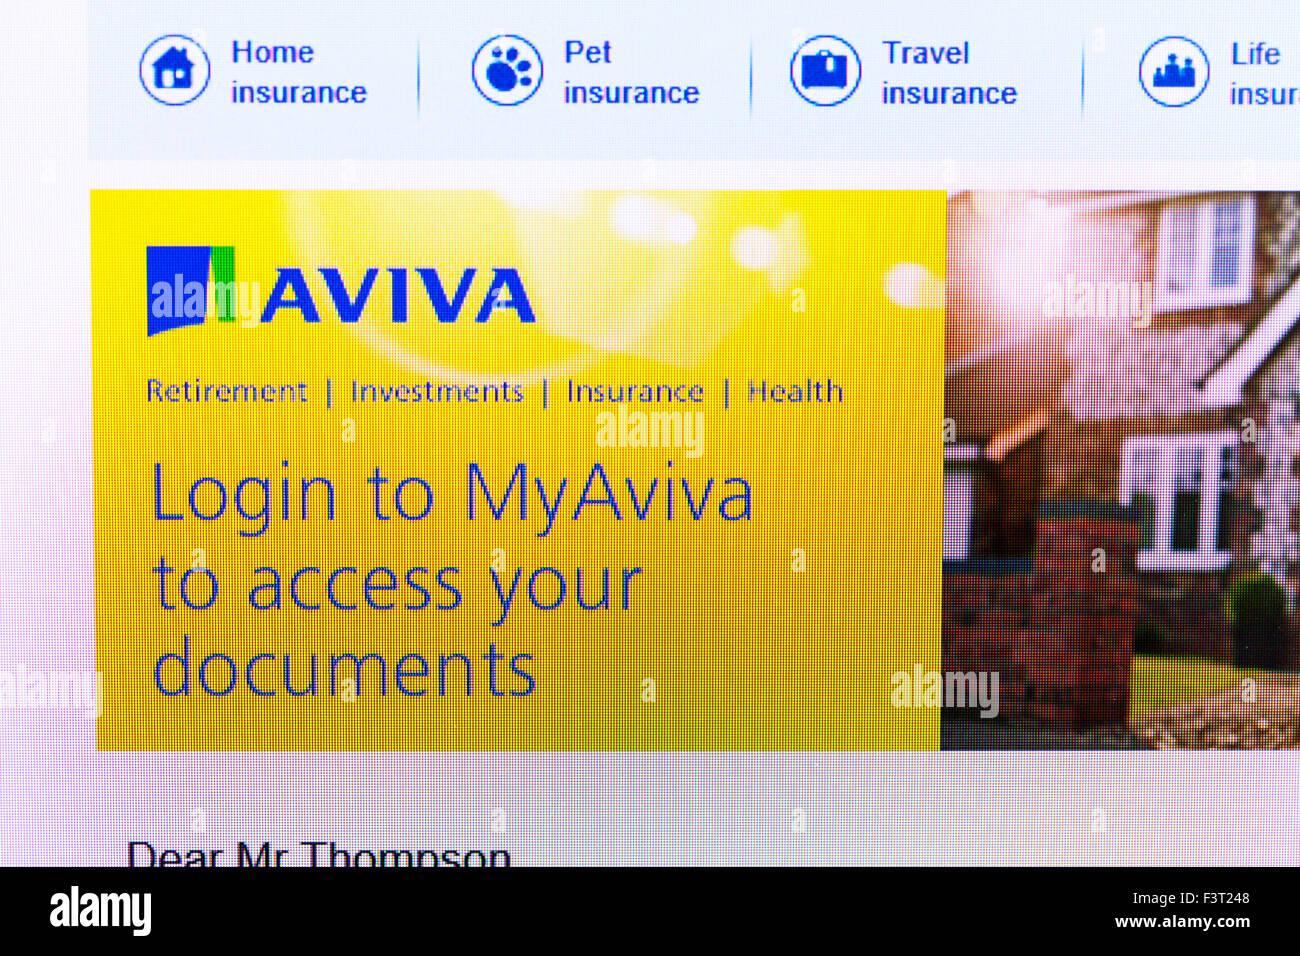 Aviva insurance website homepage online screen screenshot web site internet net login access - Stock Image